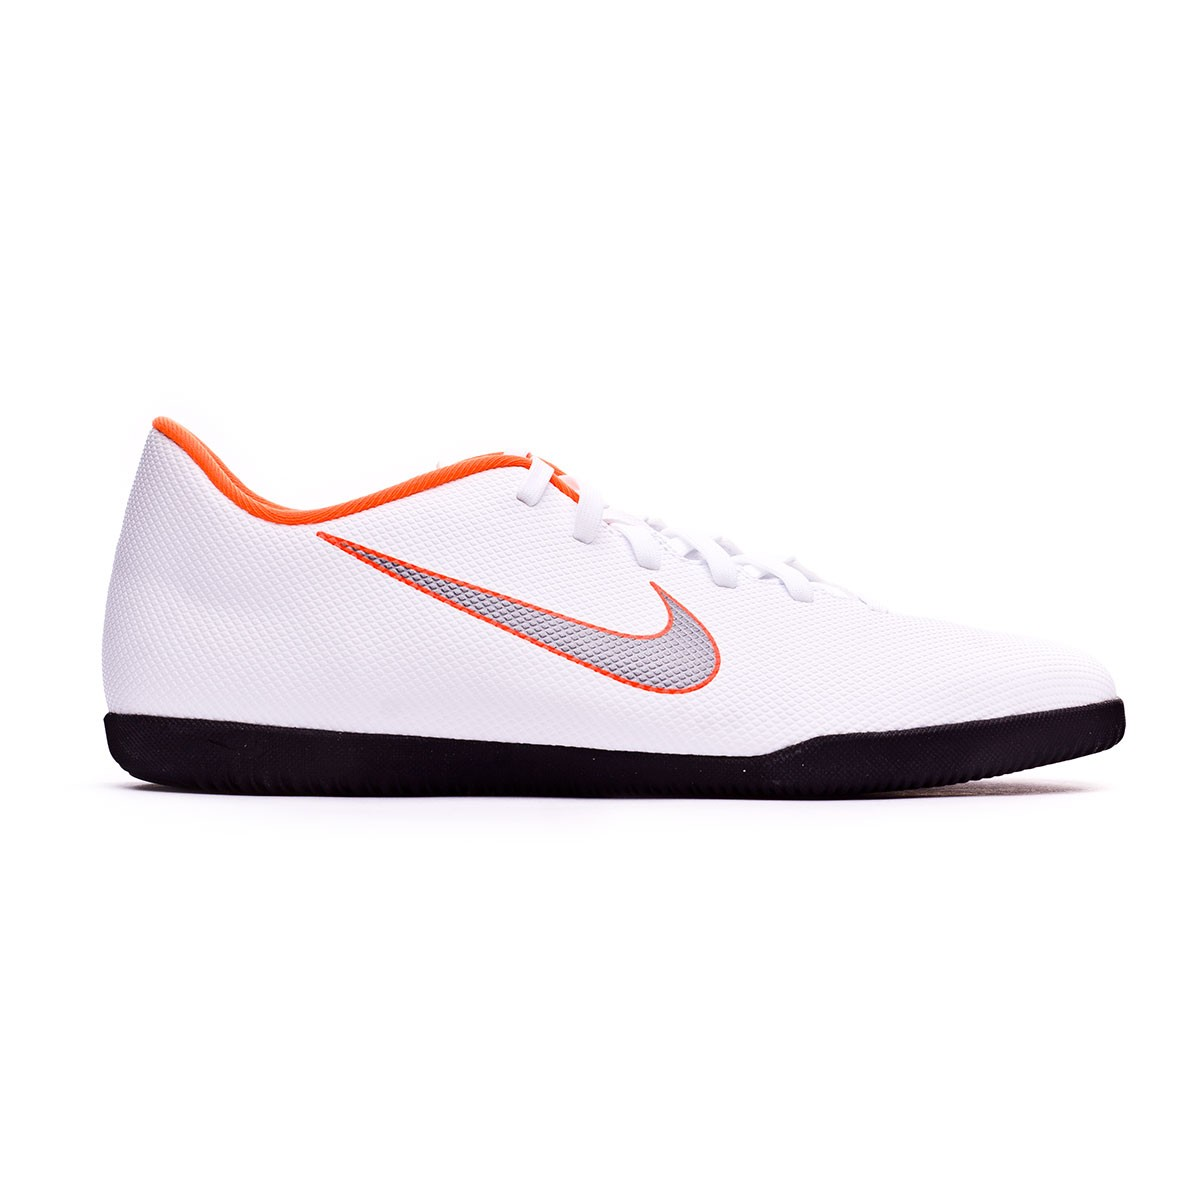 b8ec0df45c1 Futsal Boot Nike Mercurial VaporX XII Club IC White-Metallic cool  grey-Total orange - Tienda de fútbol Fútbol Emotion